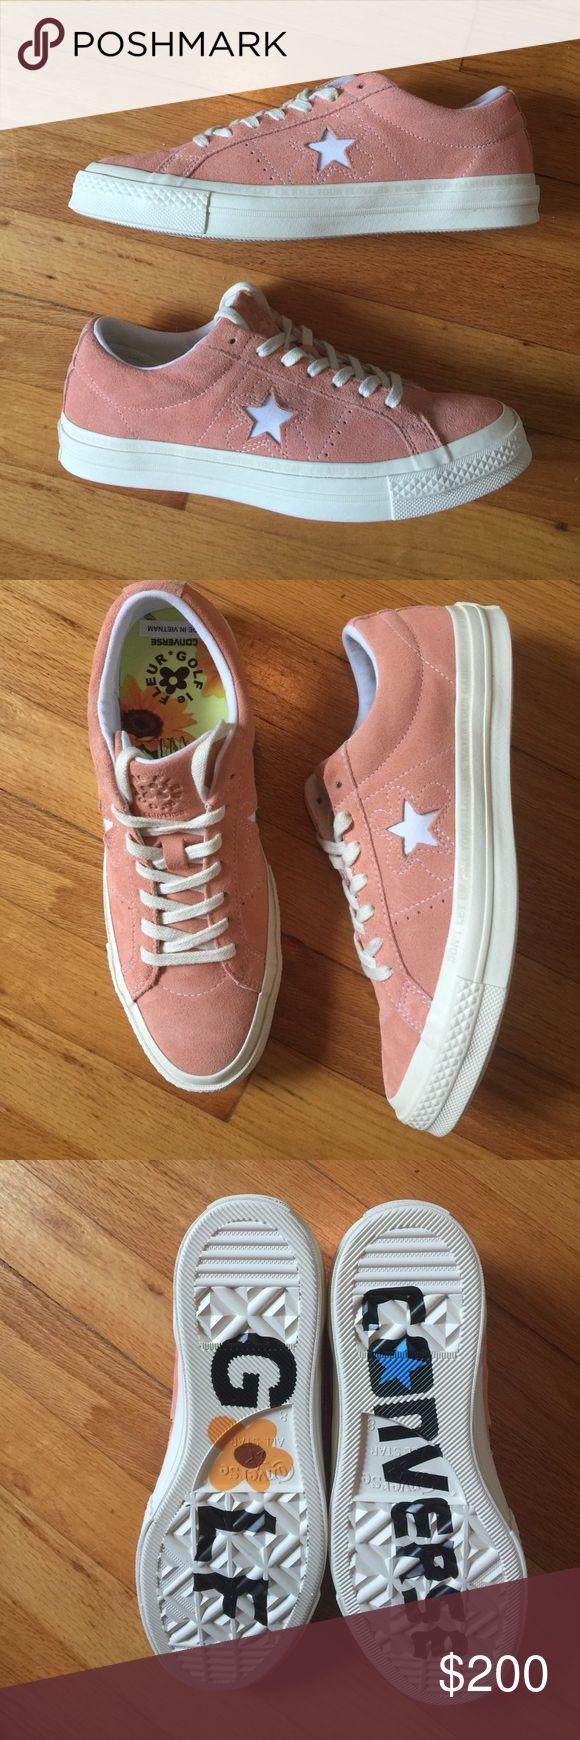 Converse- tyler the creator golf Le fleur 100% Deadstock in box. Men's size 8 = women's size 10 Converse Shoes Sneakers